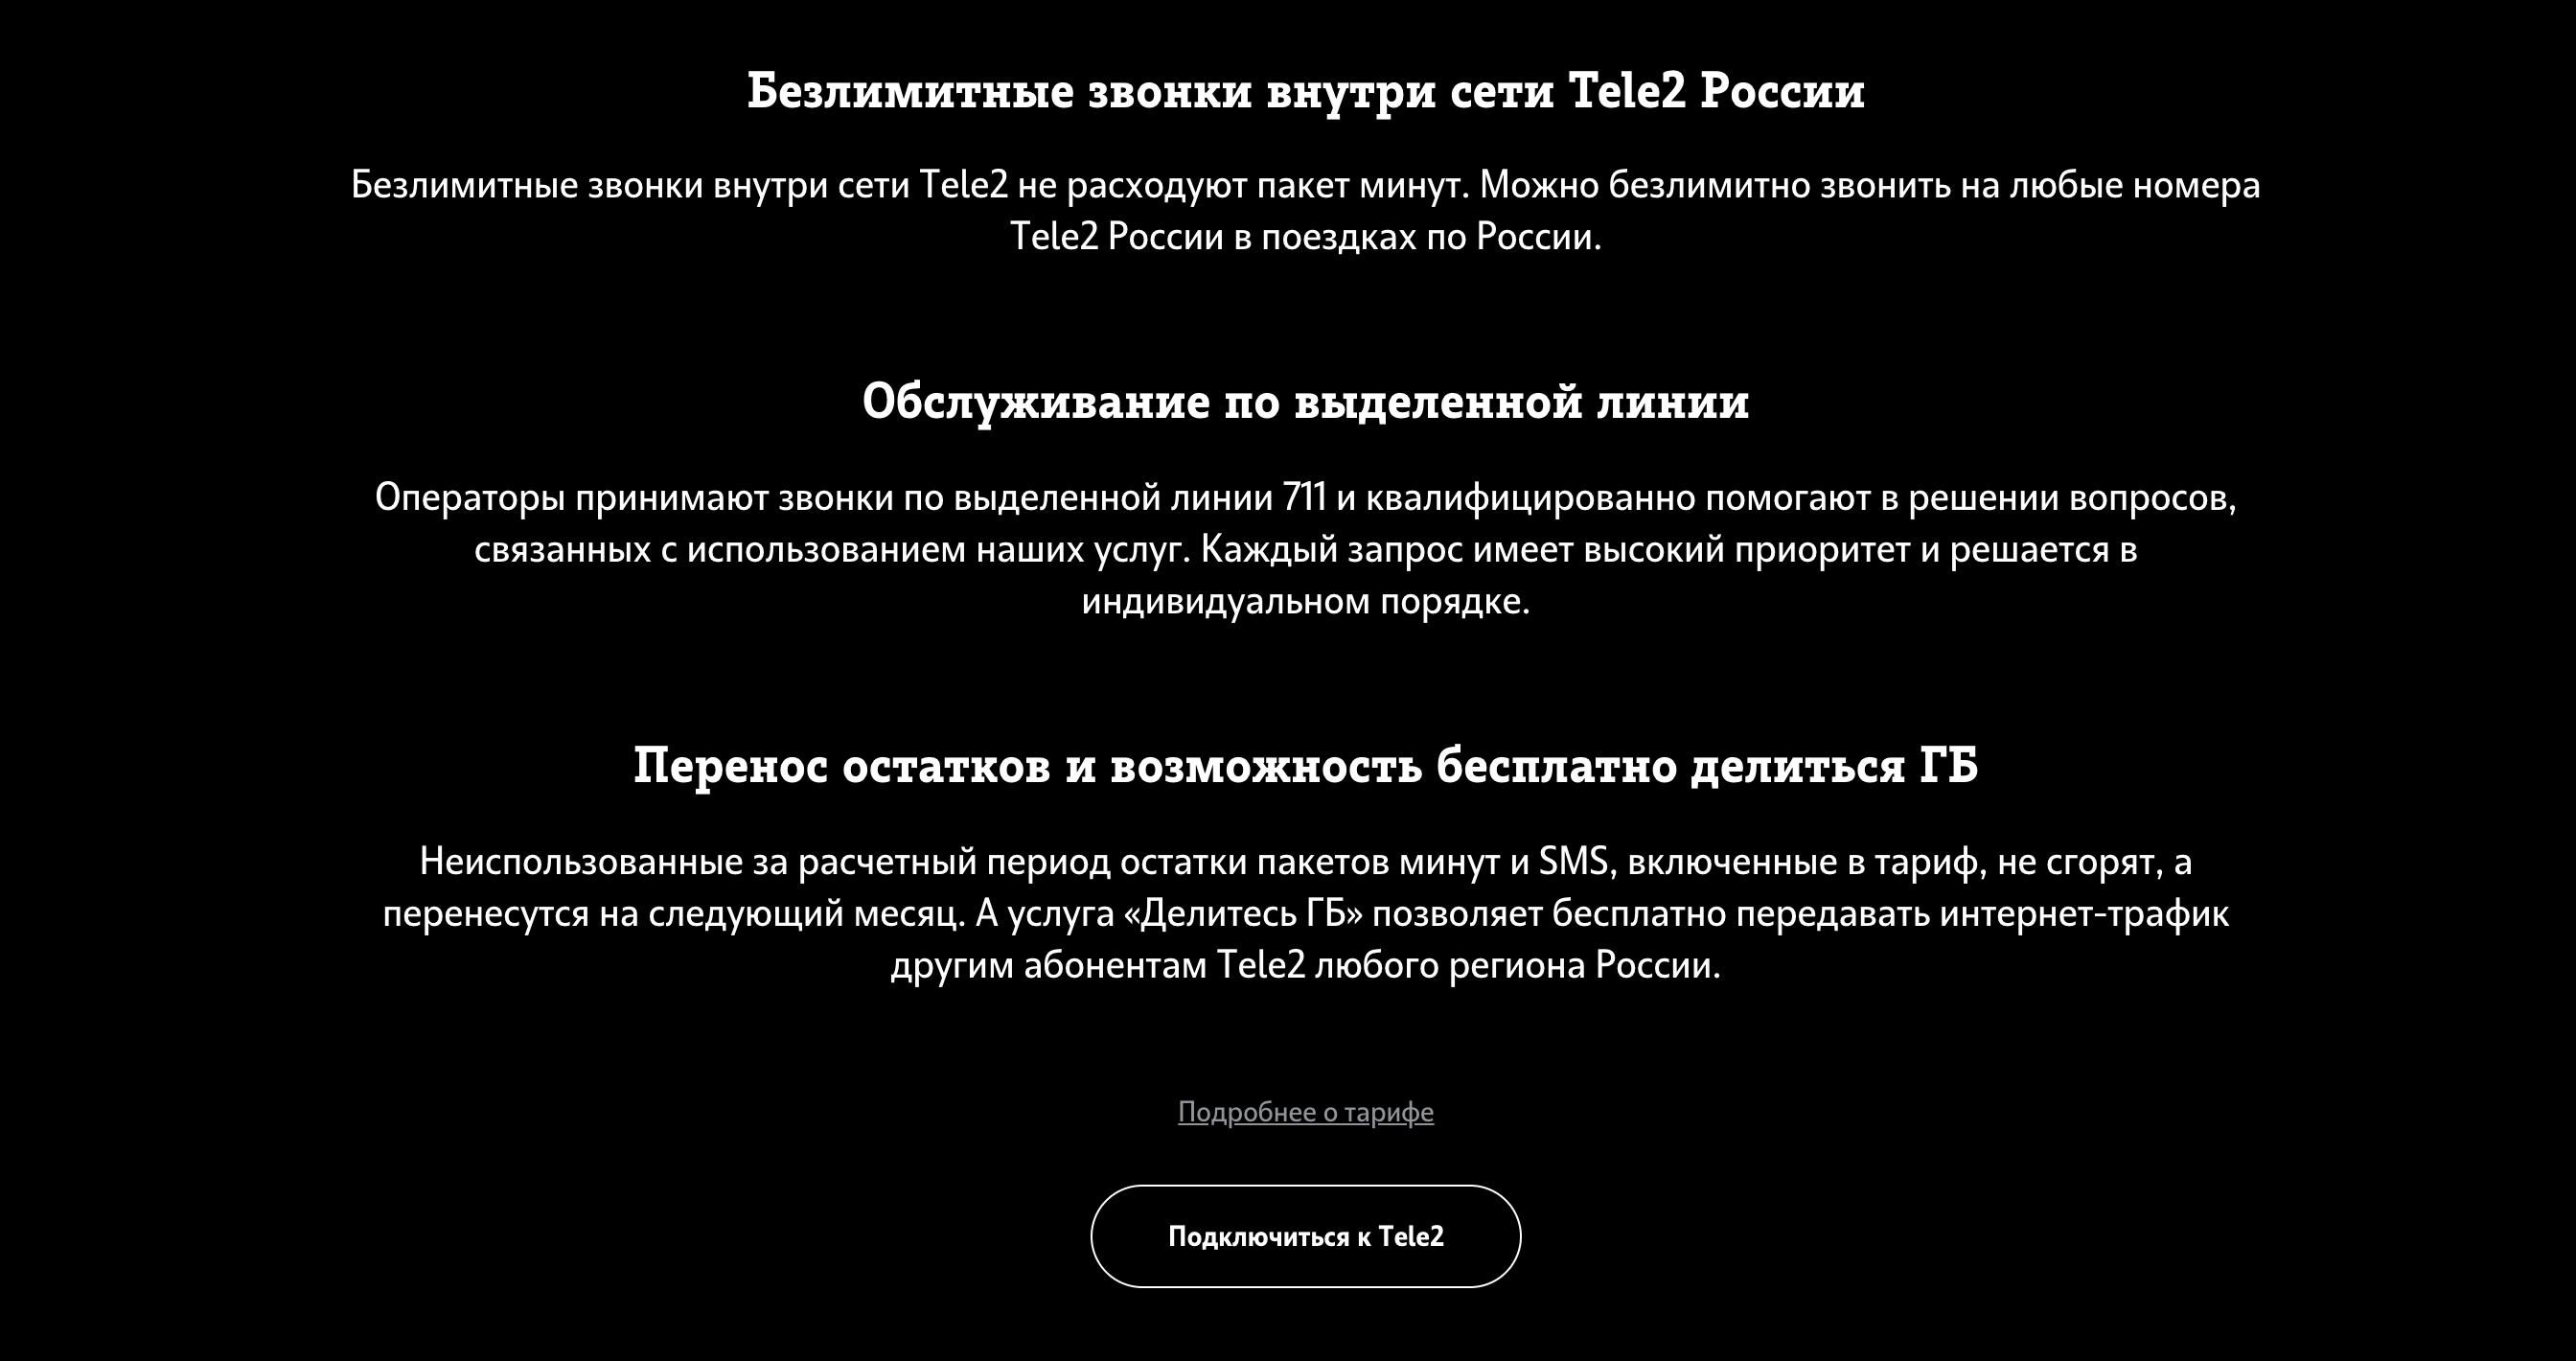 тариф премиум теле2 с безлимитным интернетом